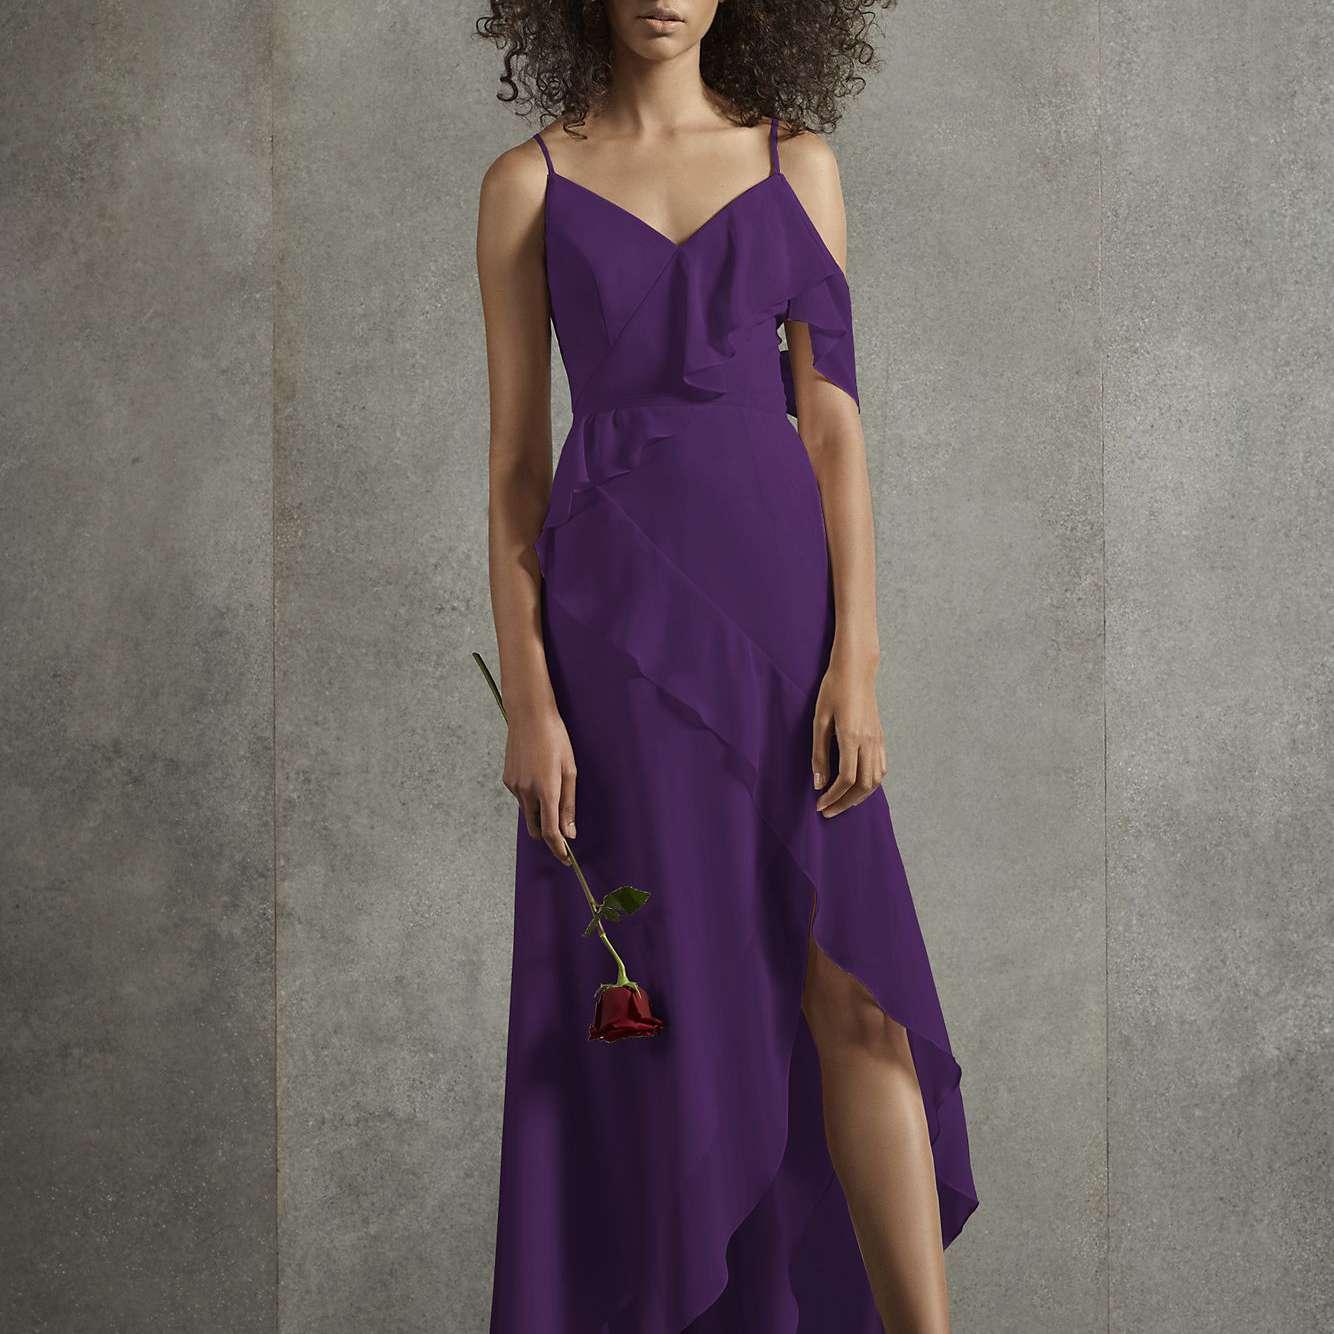 purple maids dress